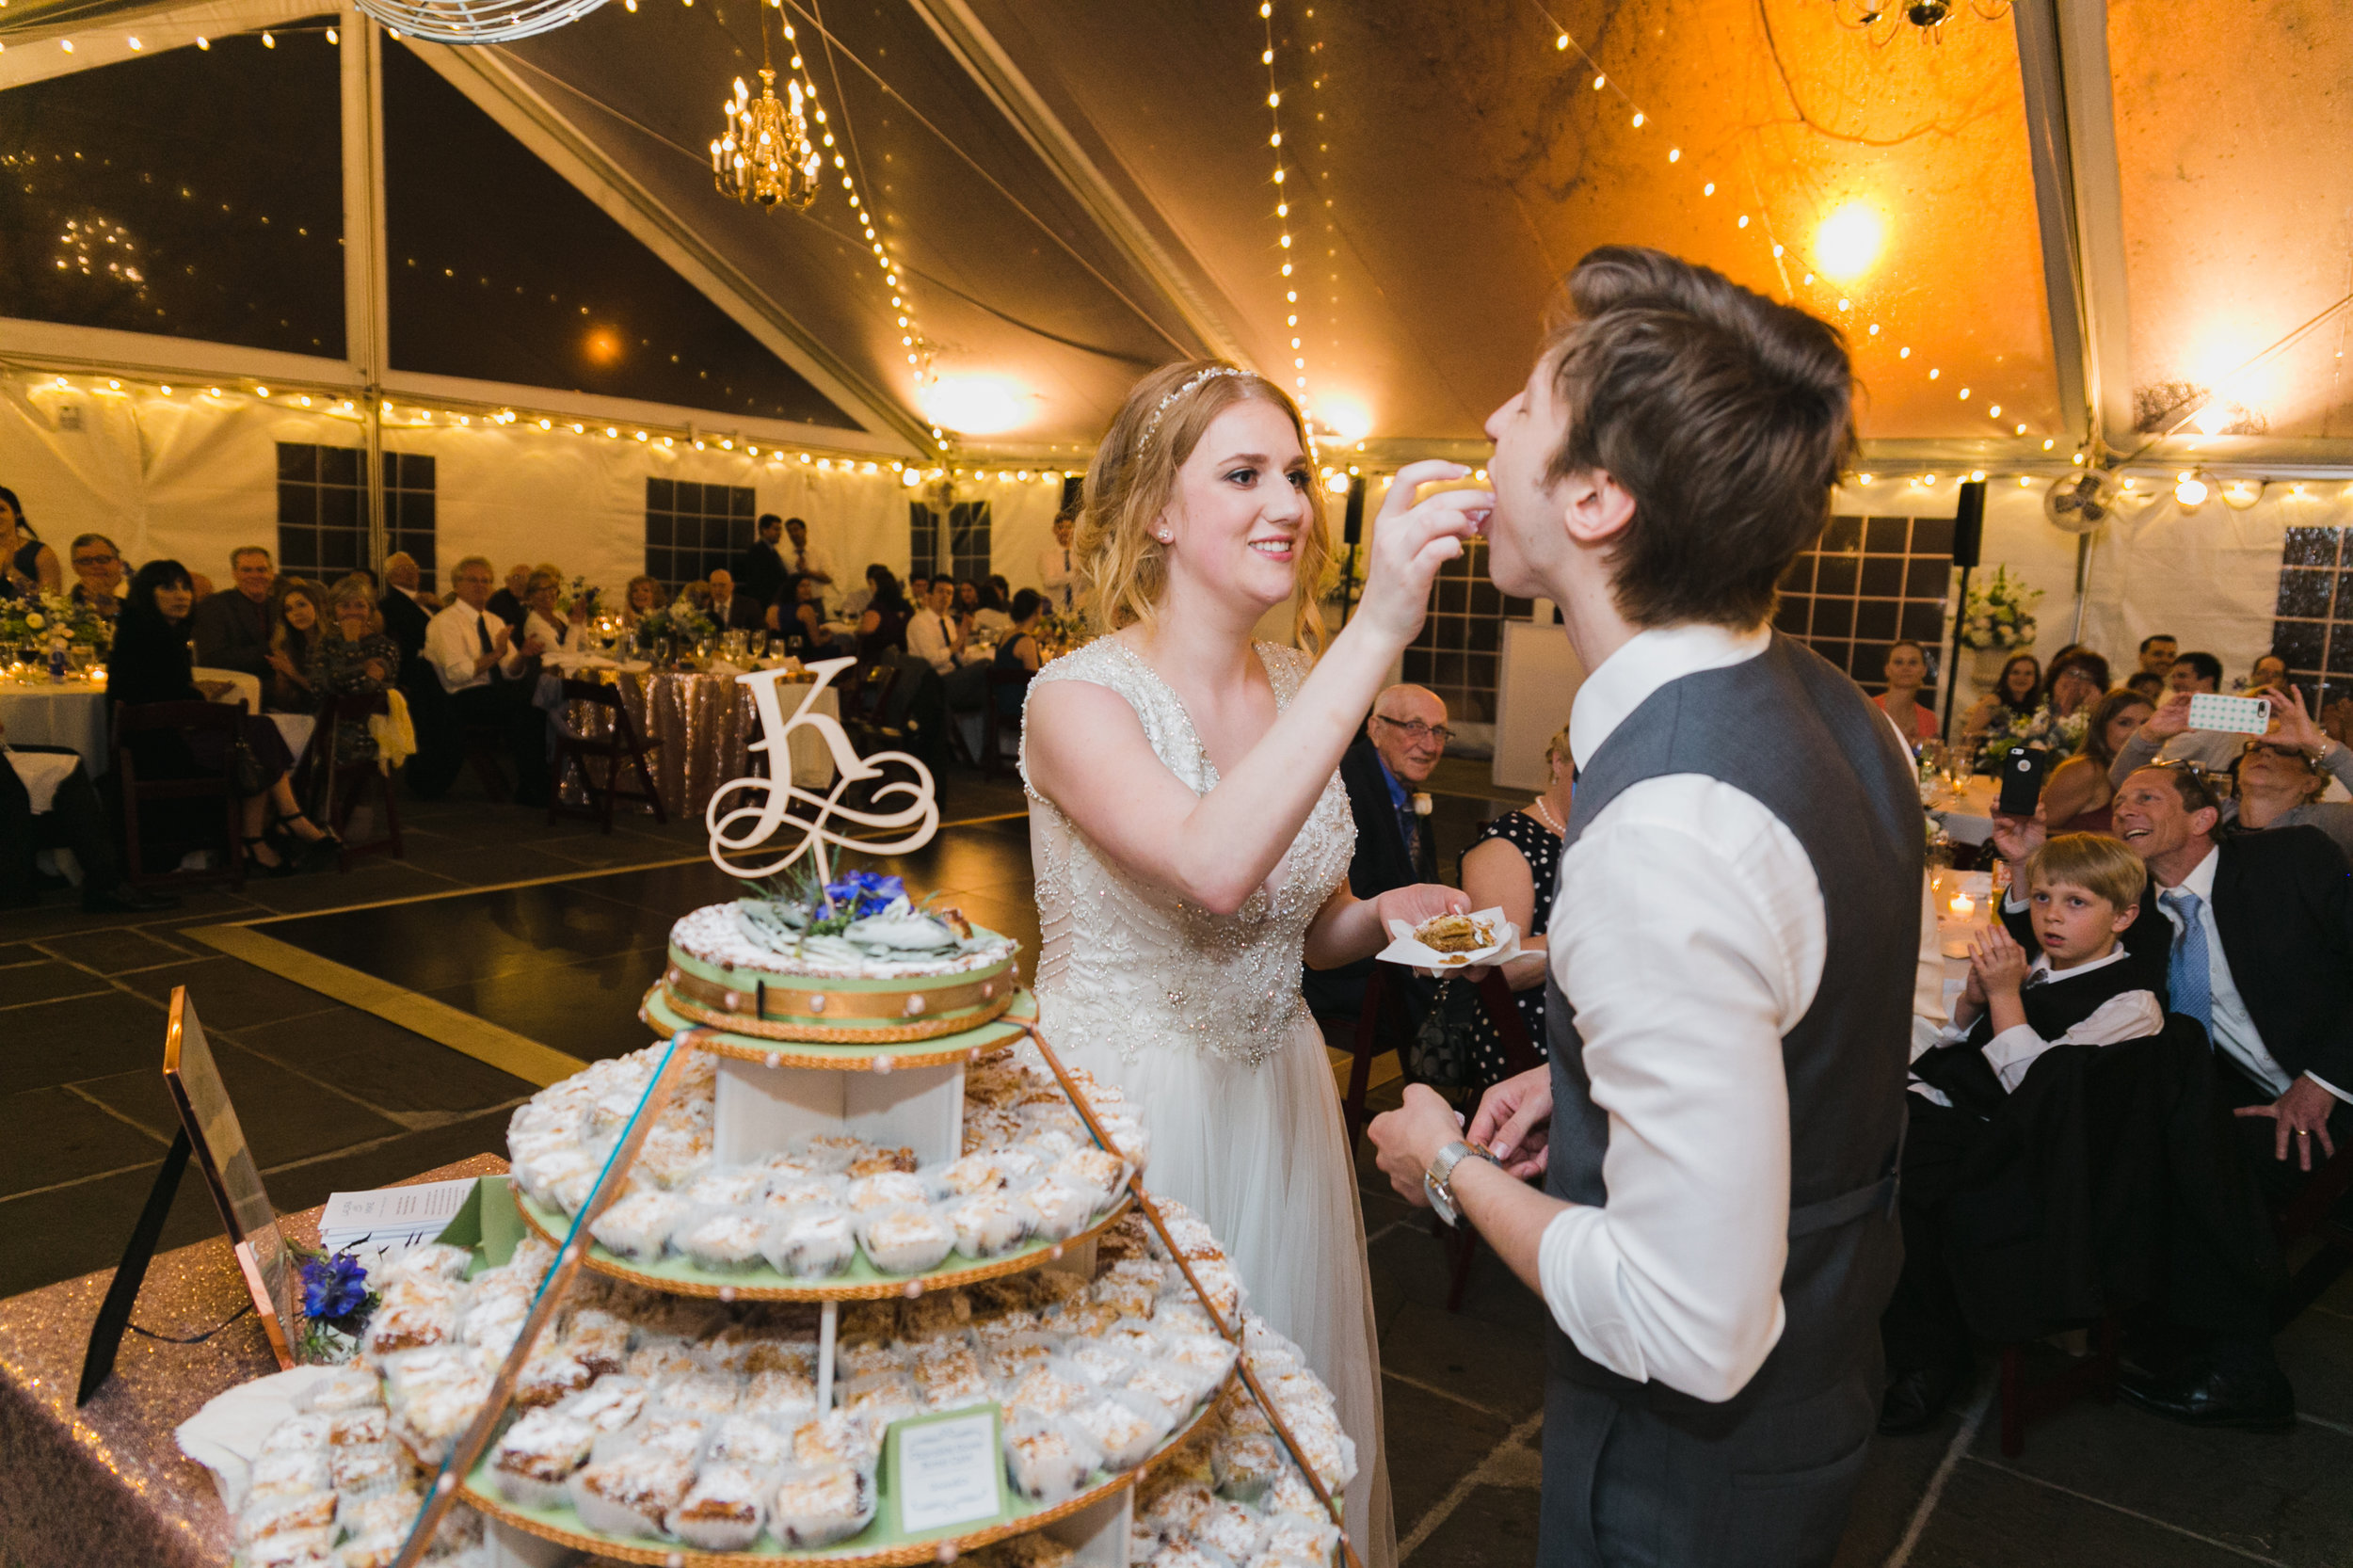 Alex-Edge-Wedding-New-Leaf-Restaurant-2.jpg